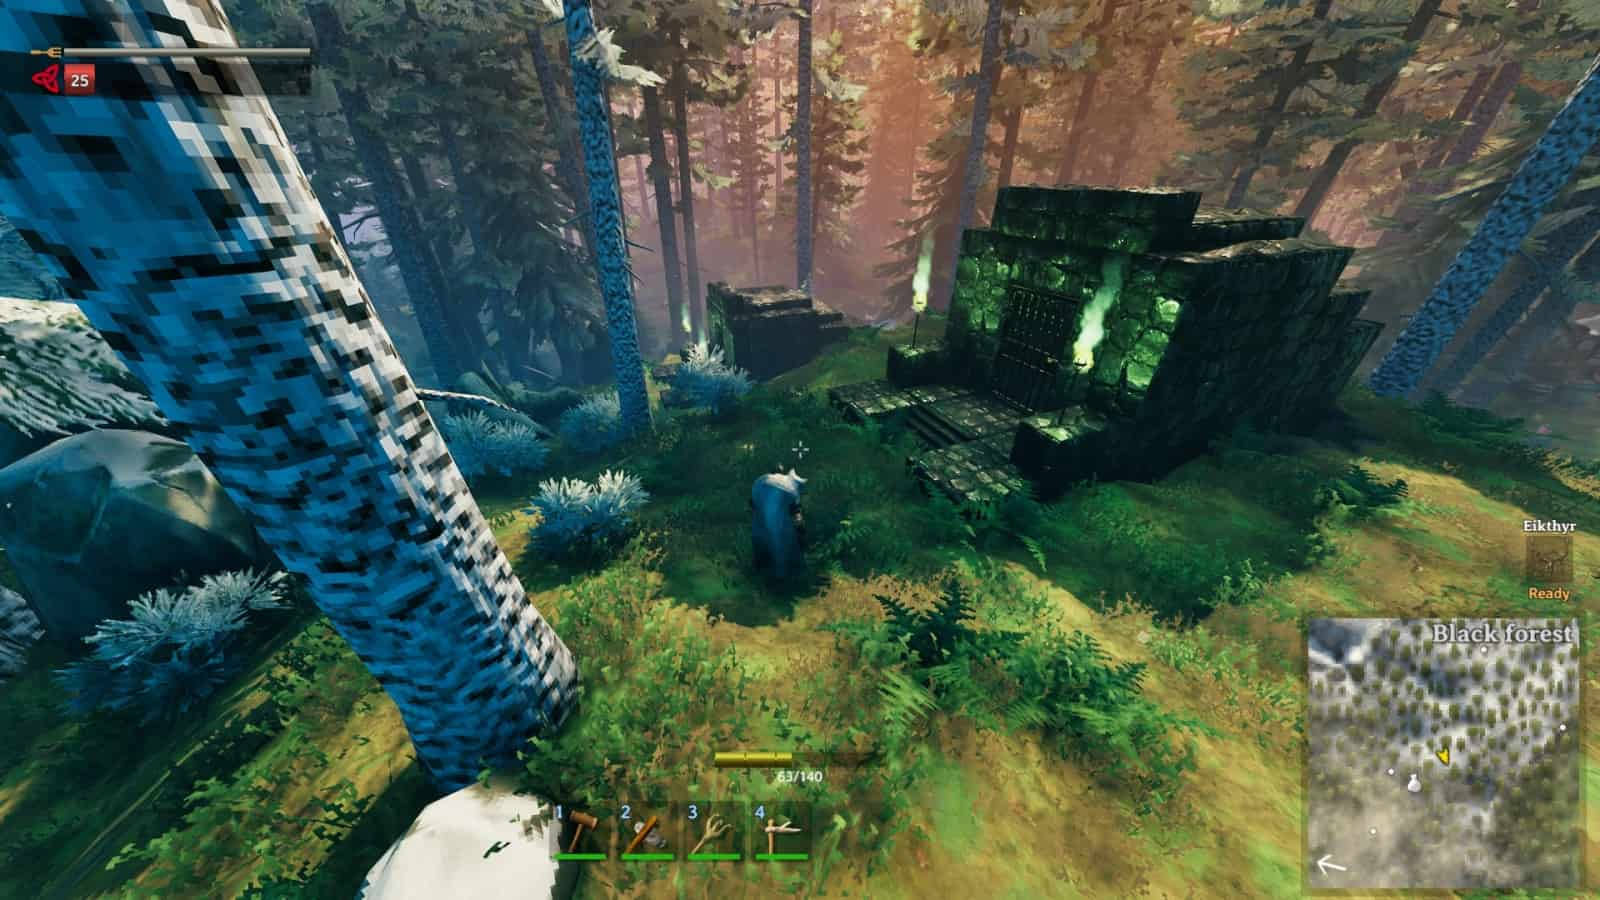 Northrend Recreated In Playable Valheim Mod 7